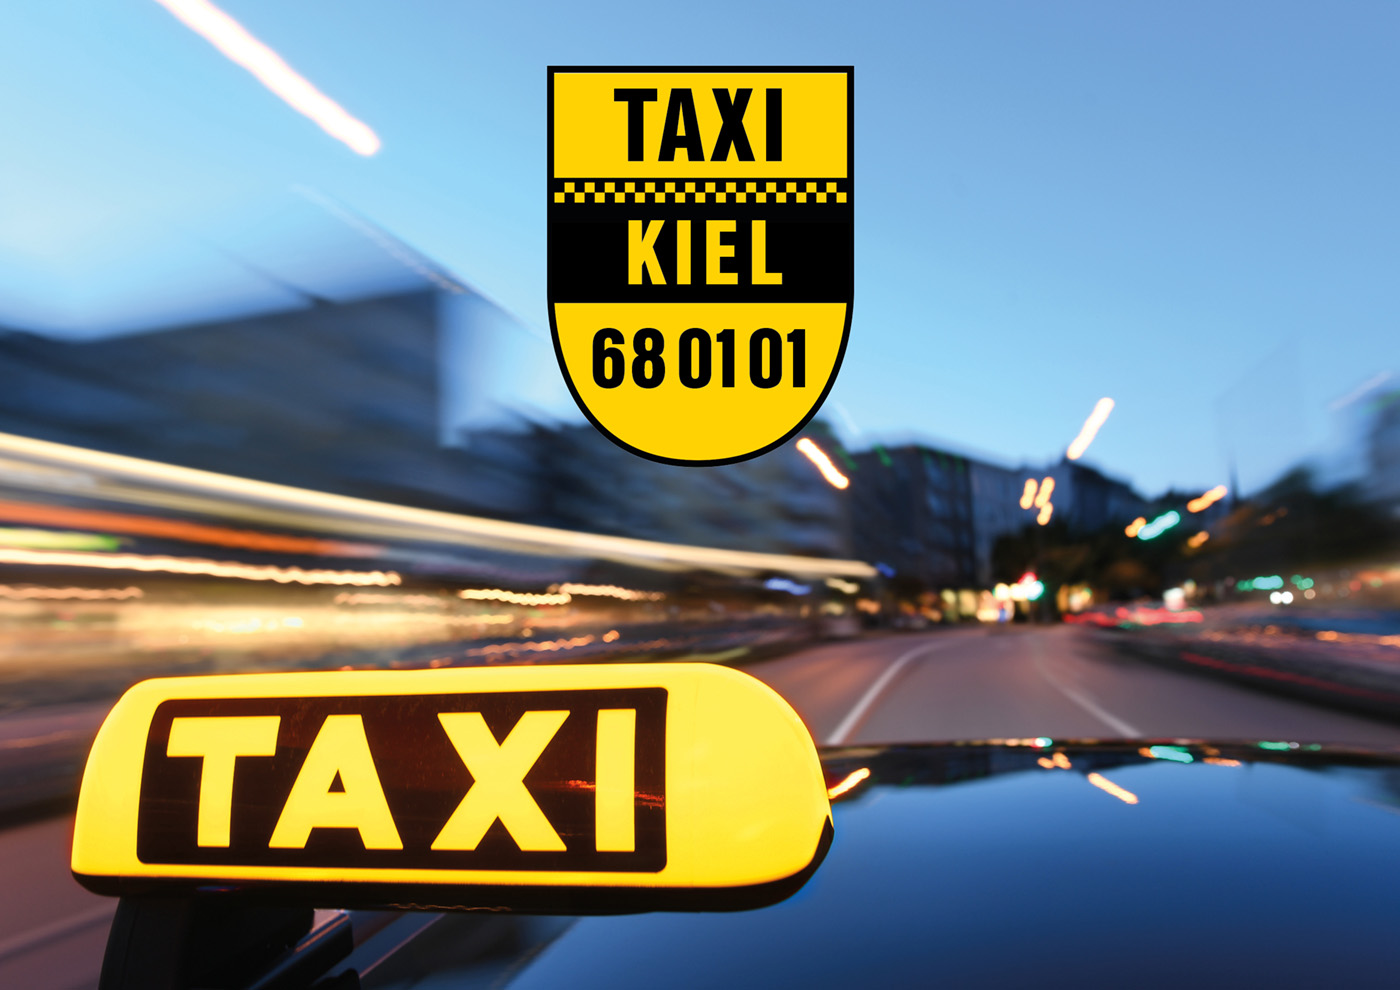 Web-Relaunch und Corporate Design für Taxi Kiel